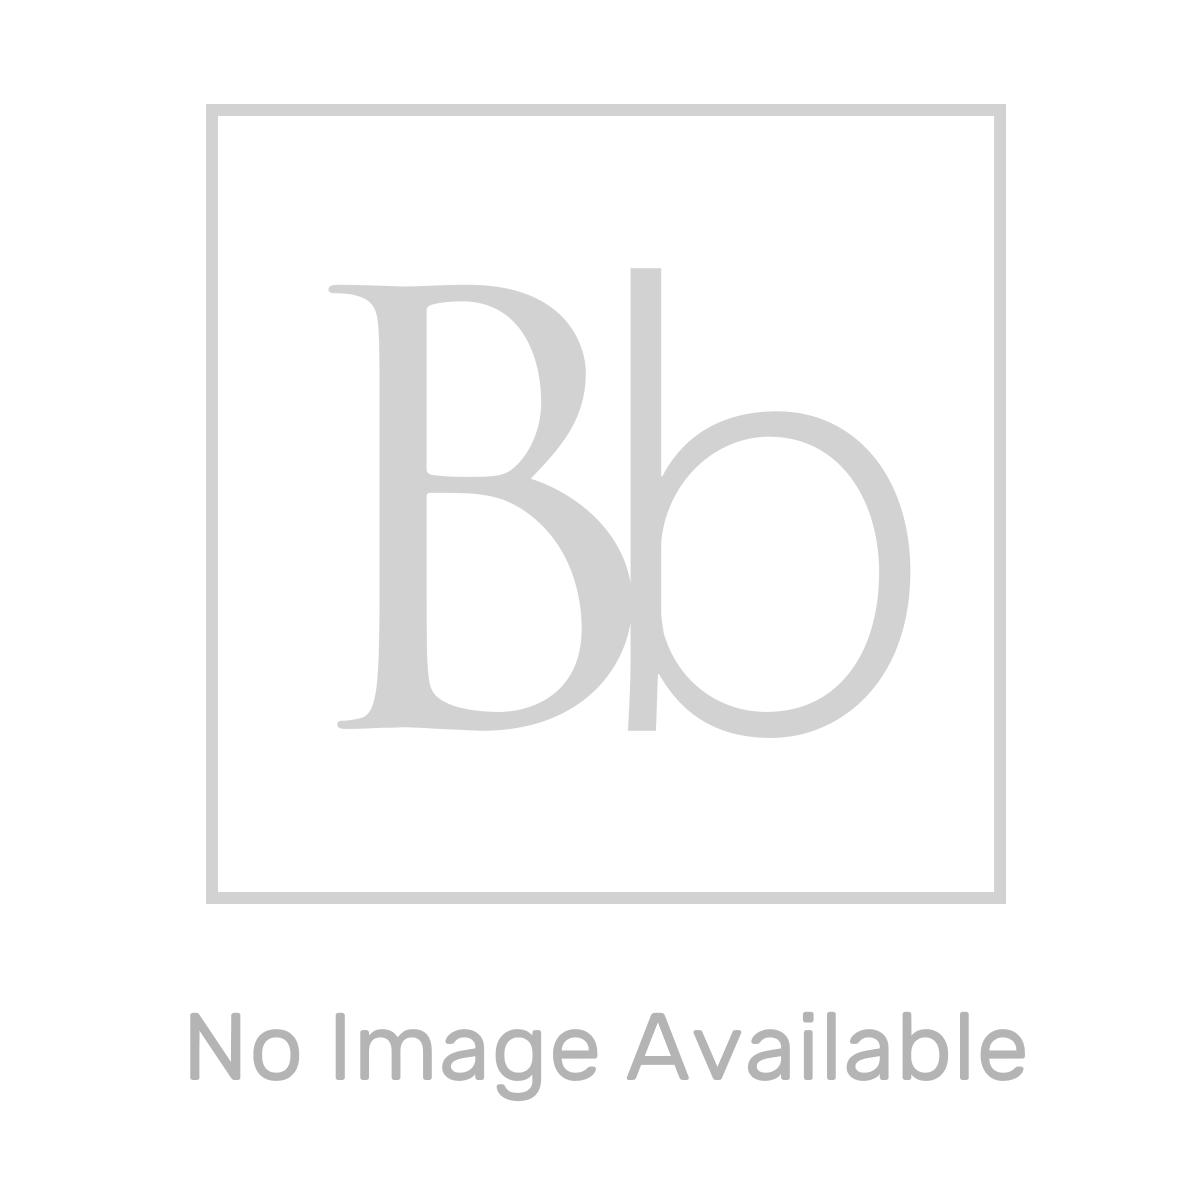 Ikoma White Gloss Vanity Unit with Basin 650mm Roomset